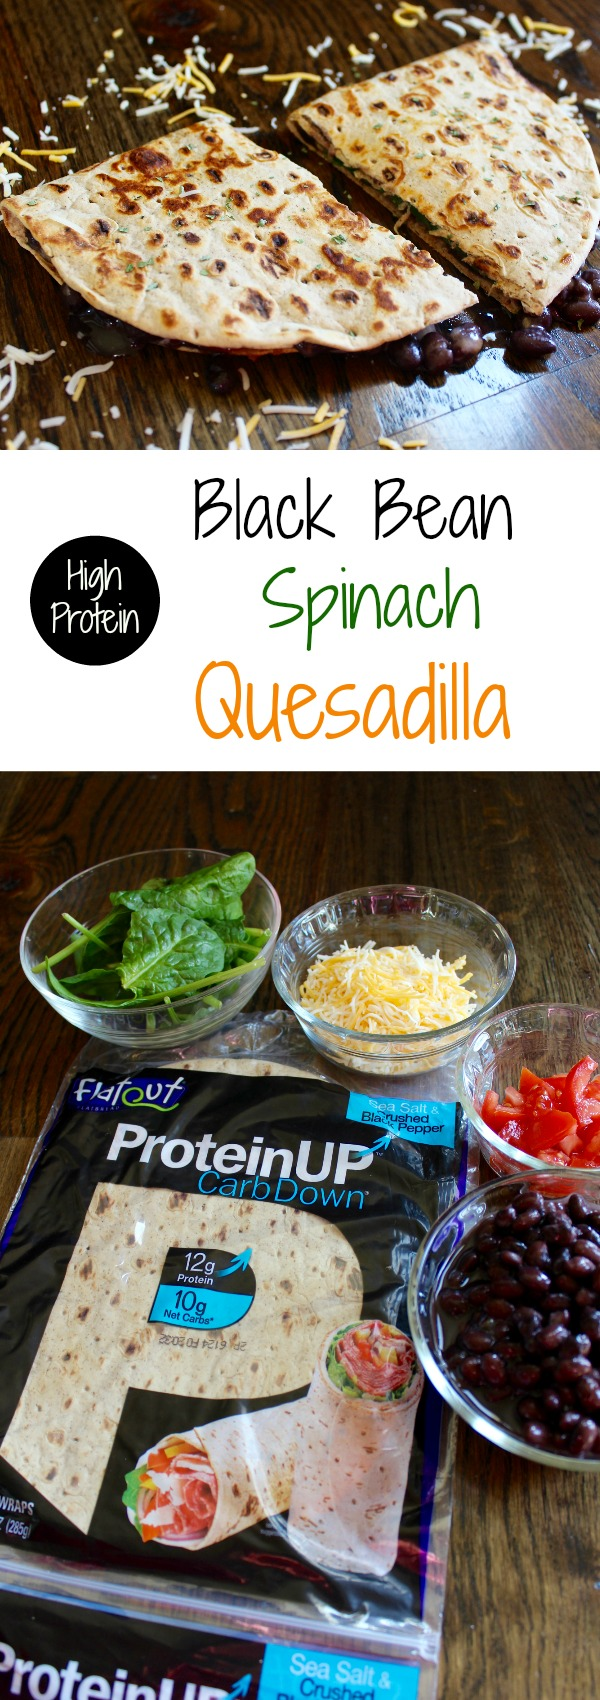 black-bean-spinach-quesadilla